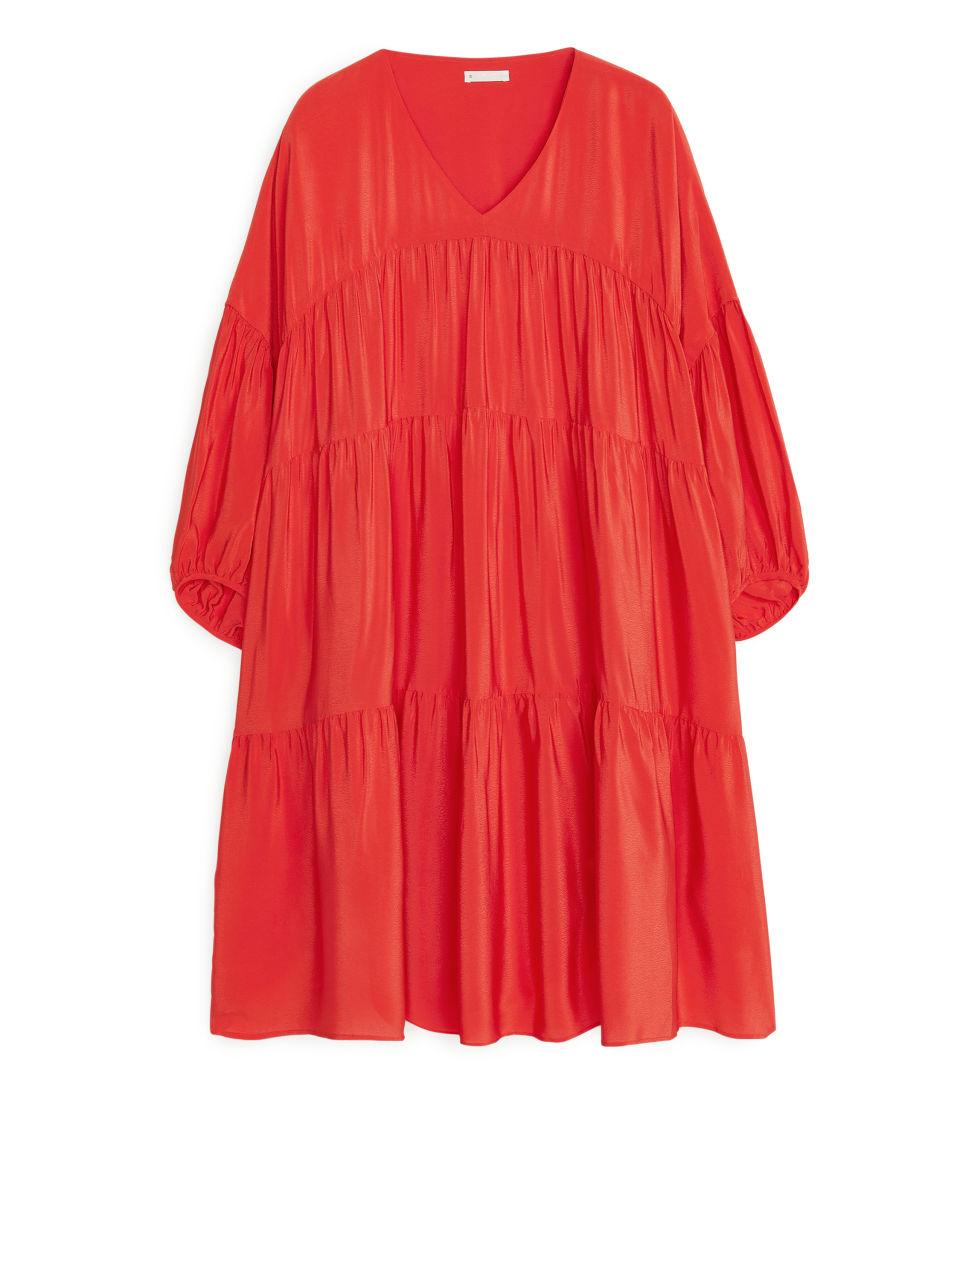 Short Ruffled Dress - Red